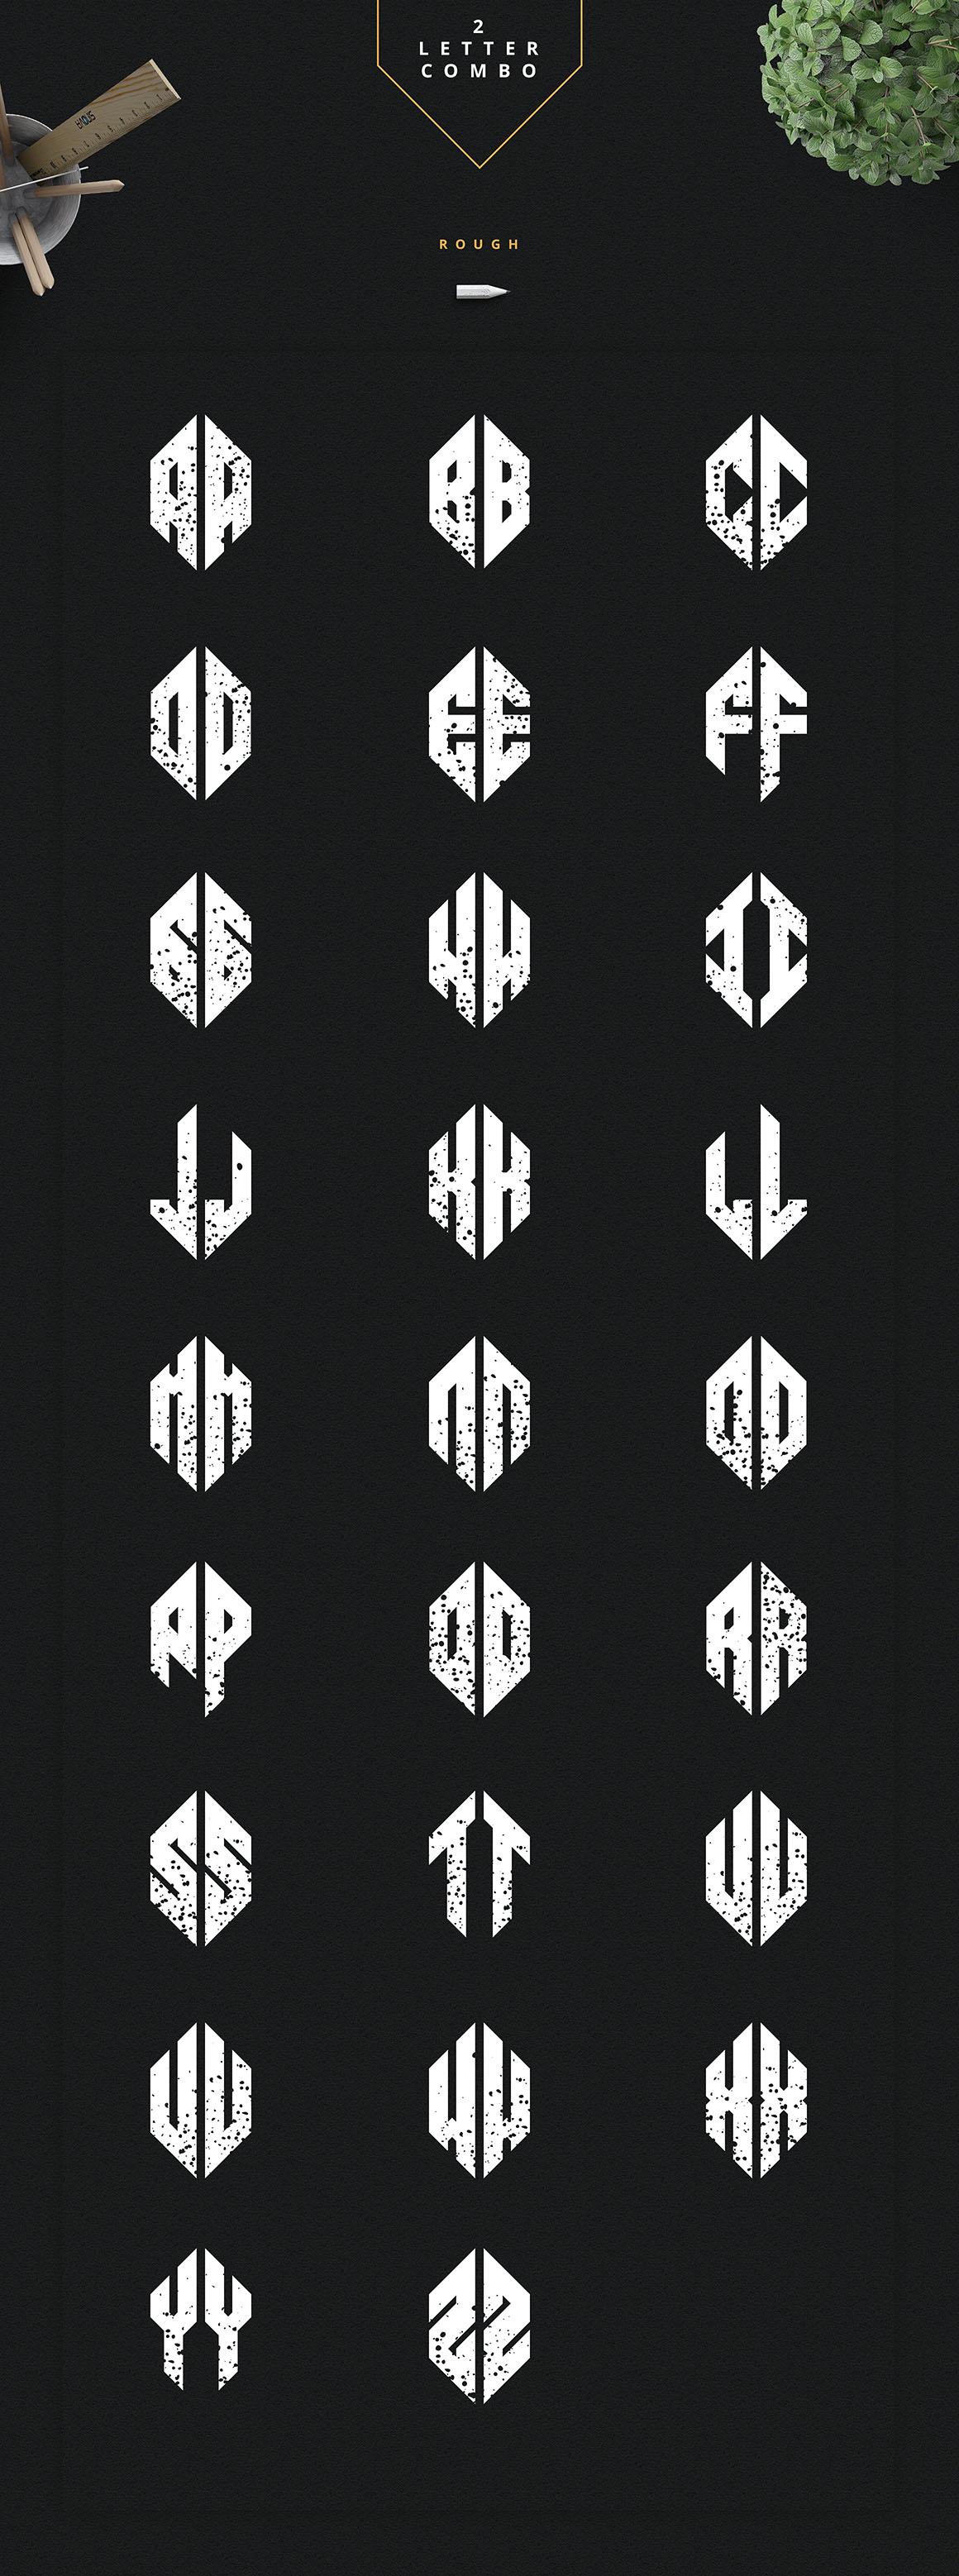 6in1-Ultimate-Monogram-creator-07.jpg